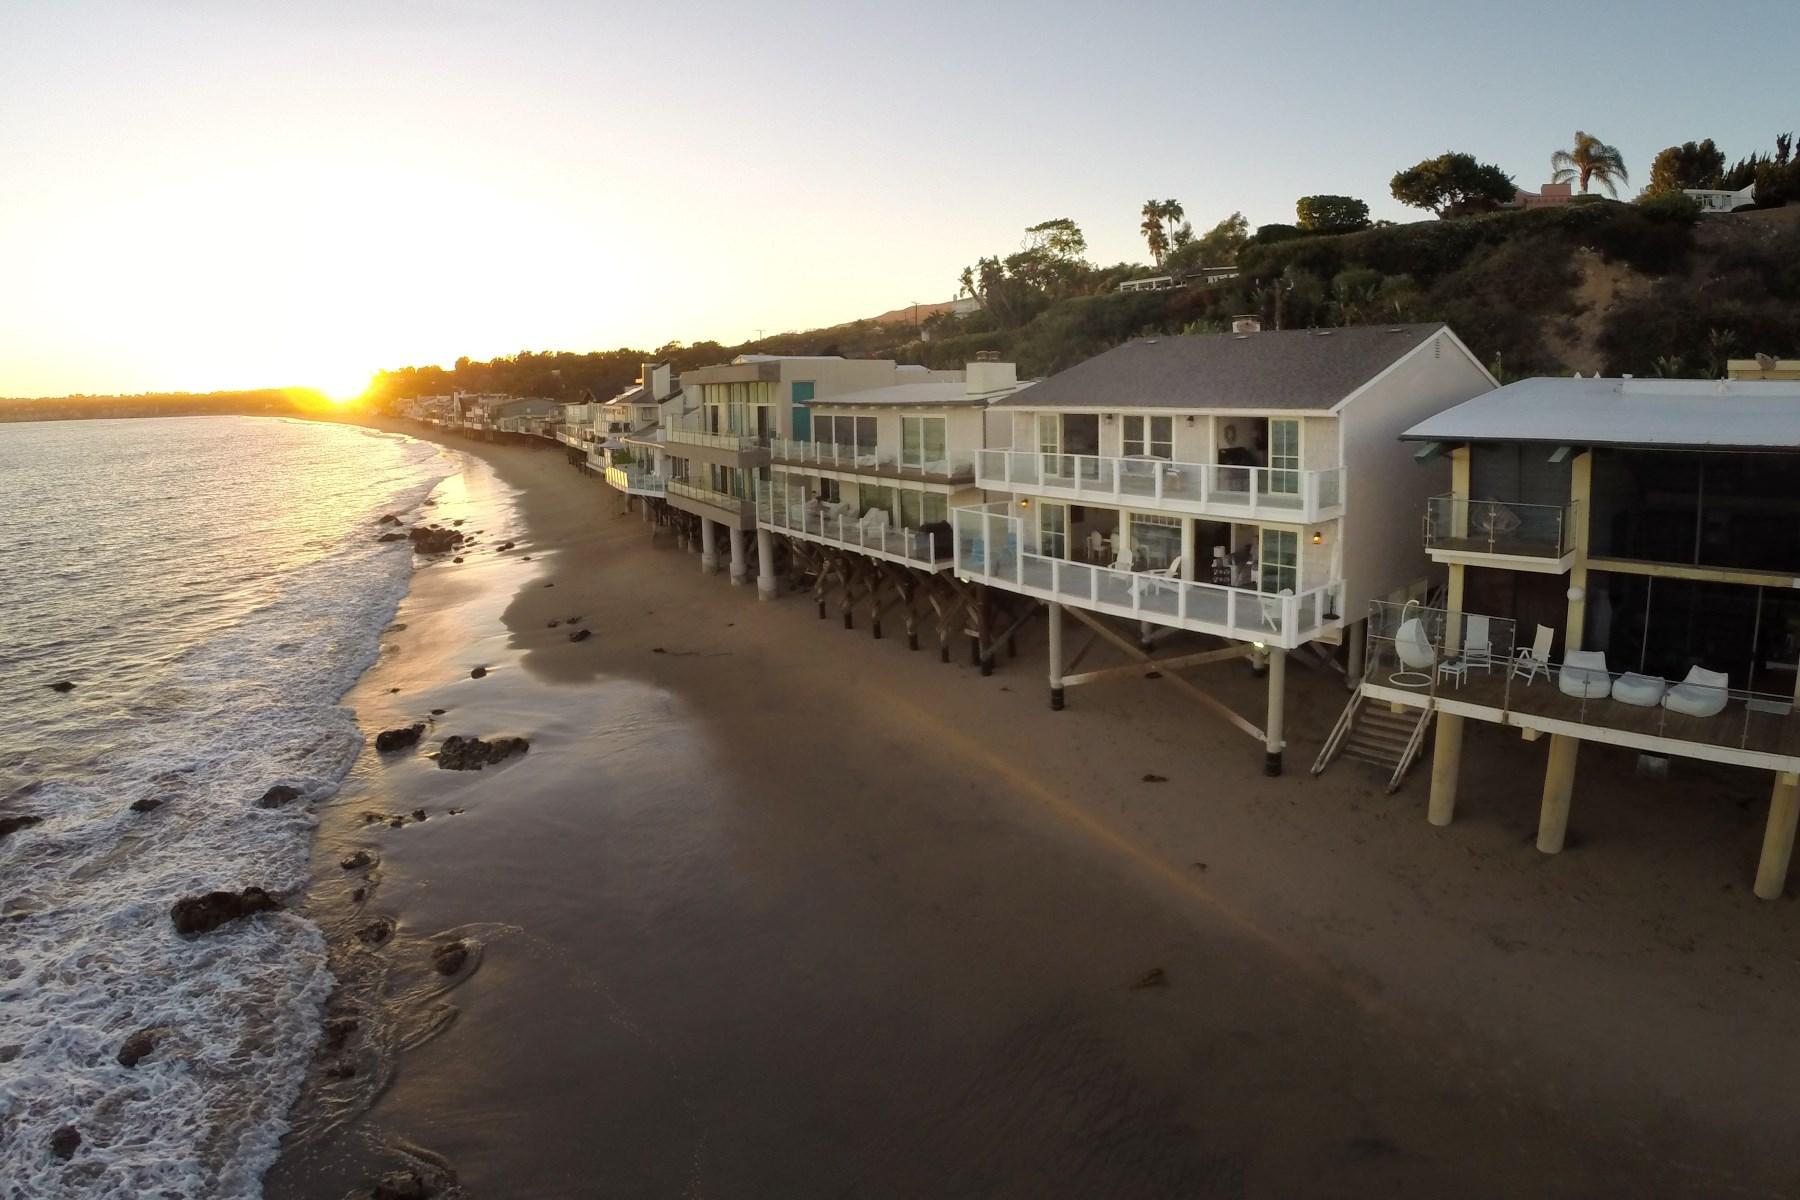 Casa Unifamiliar por un Alquiler en Malibu Cove Colony for Summer Lease! 27002 Malibu Cove Colony Malibu, California, 90265 Estados Unidos